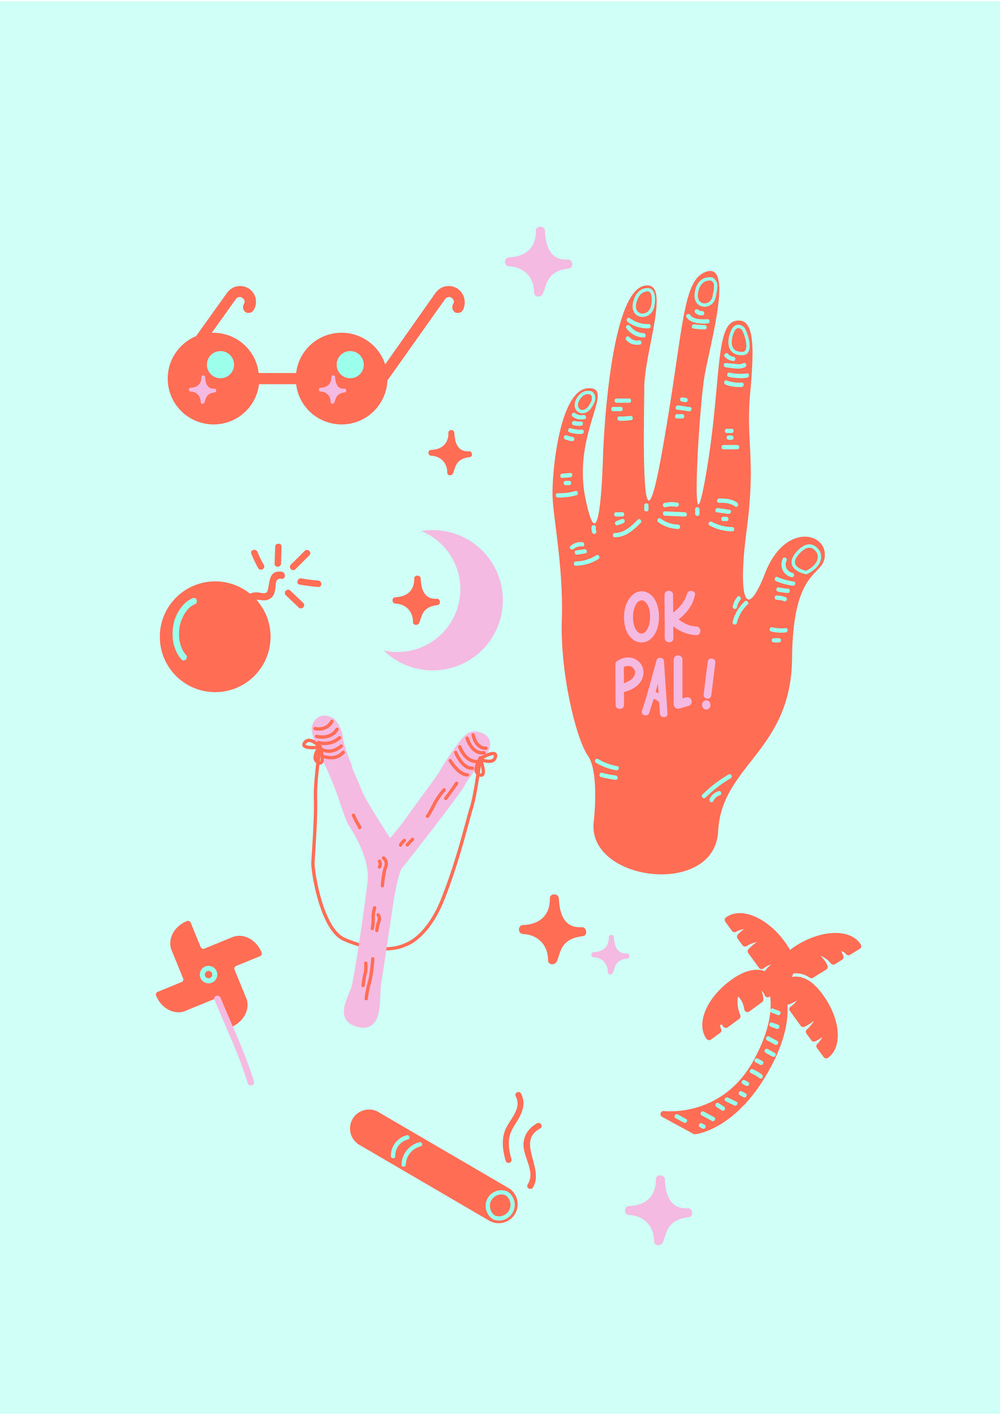 OK_PAL-01.png